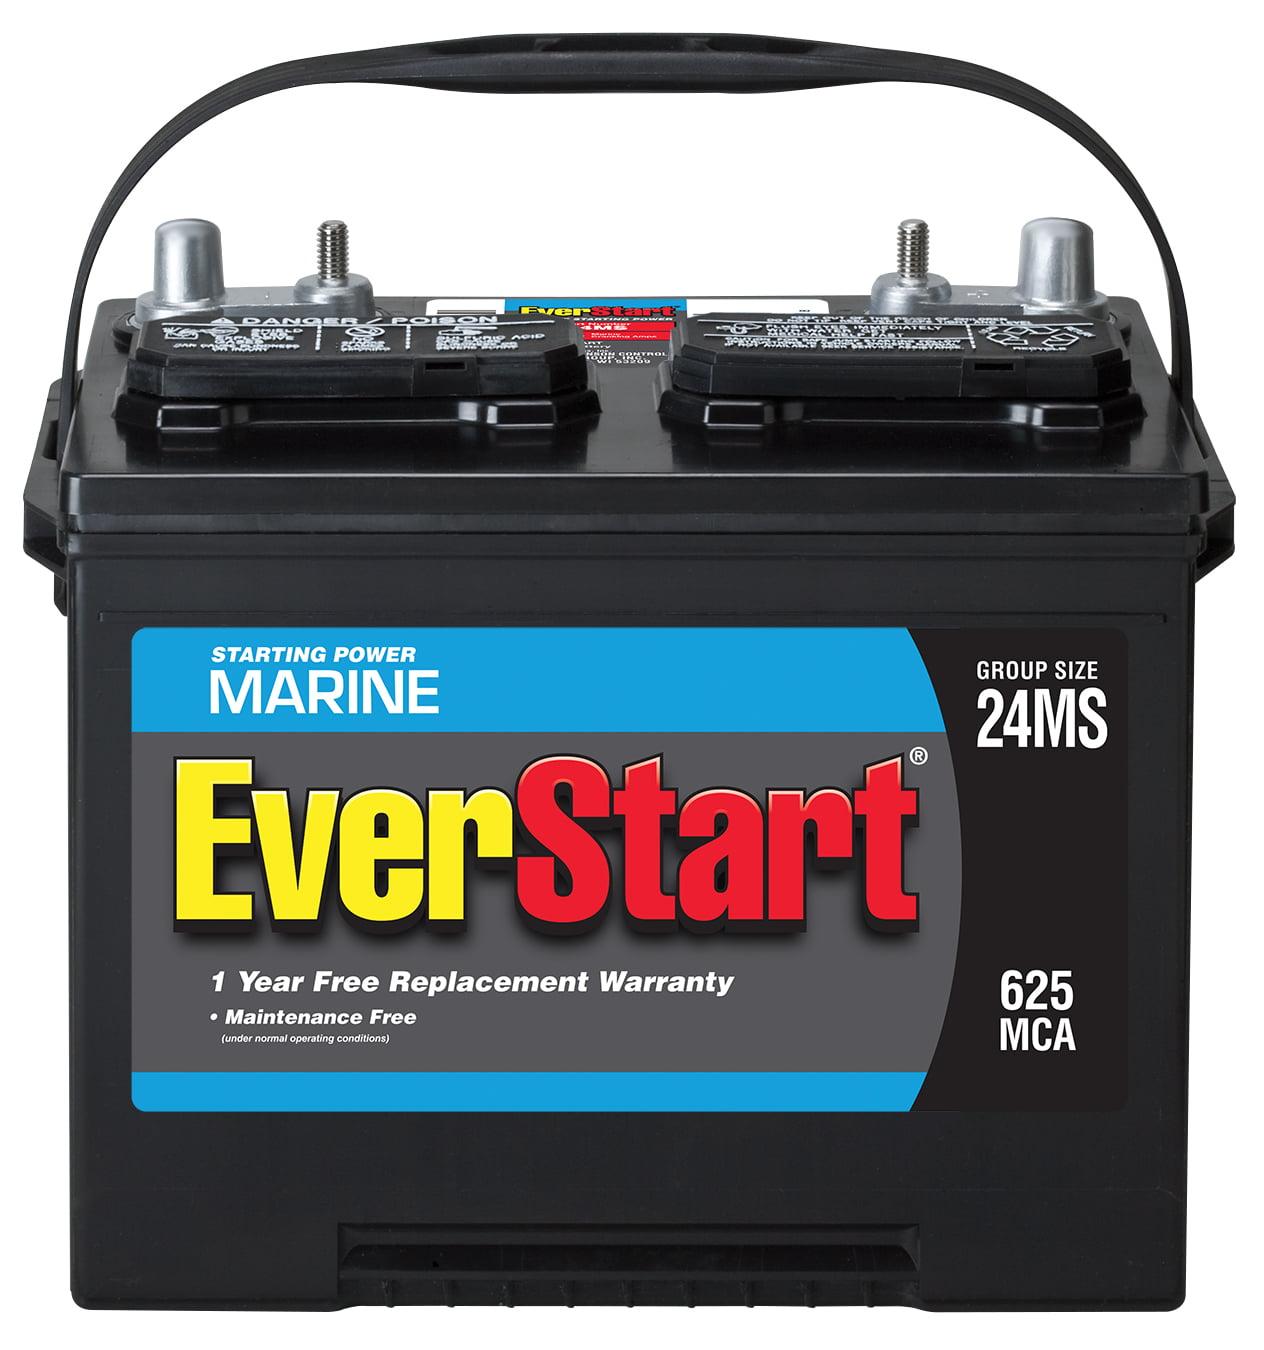 Everstart 24ms Marine Starting Battery Best Marine Batteries